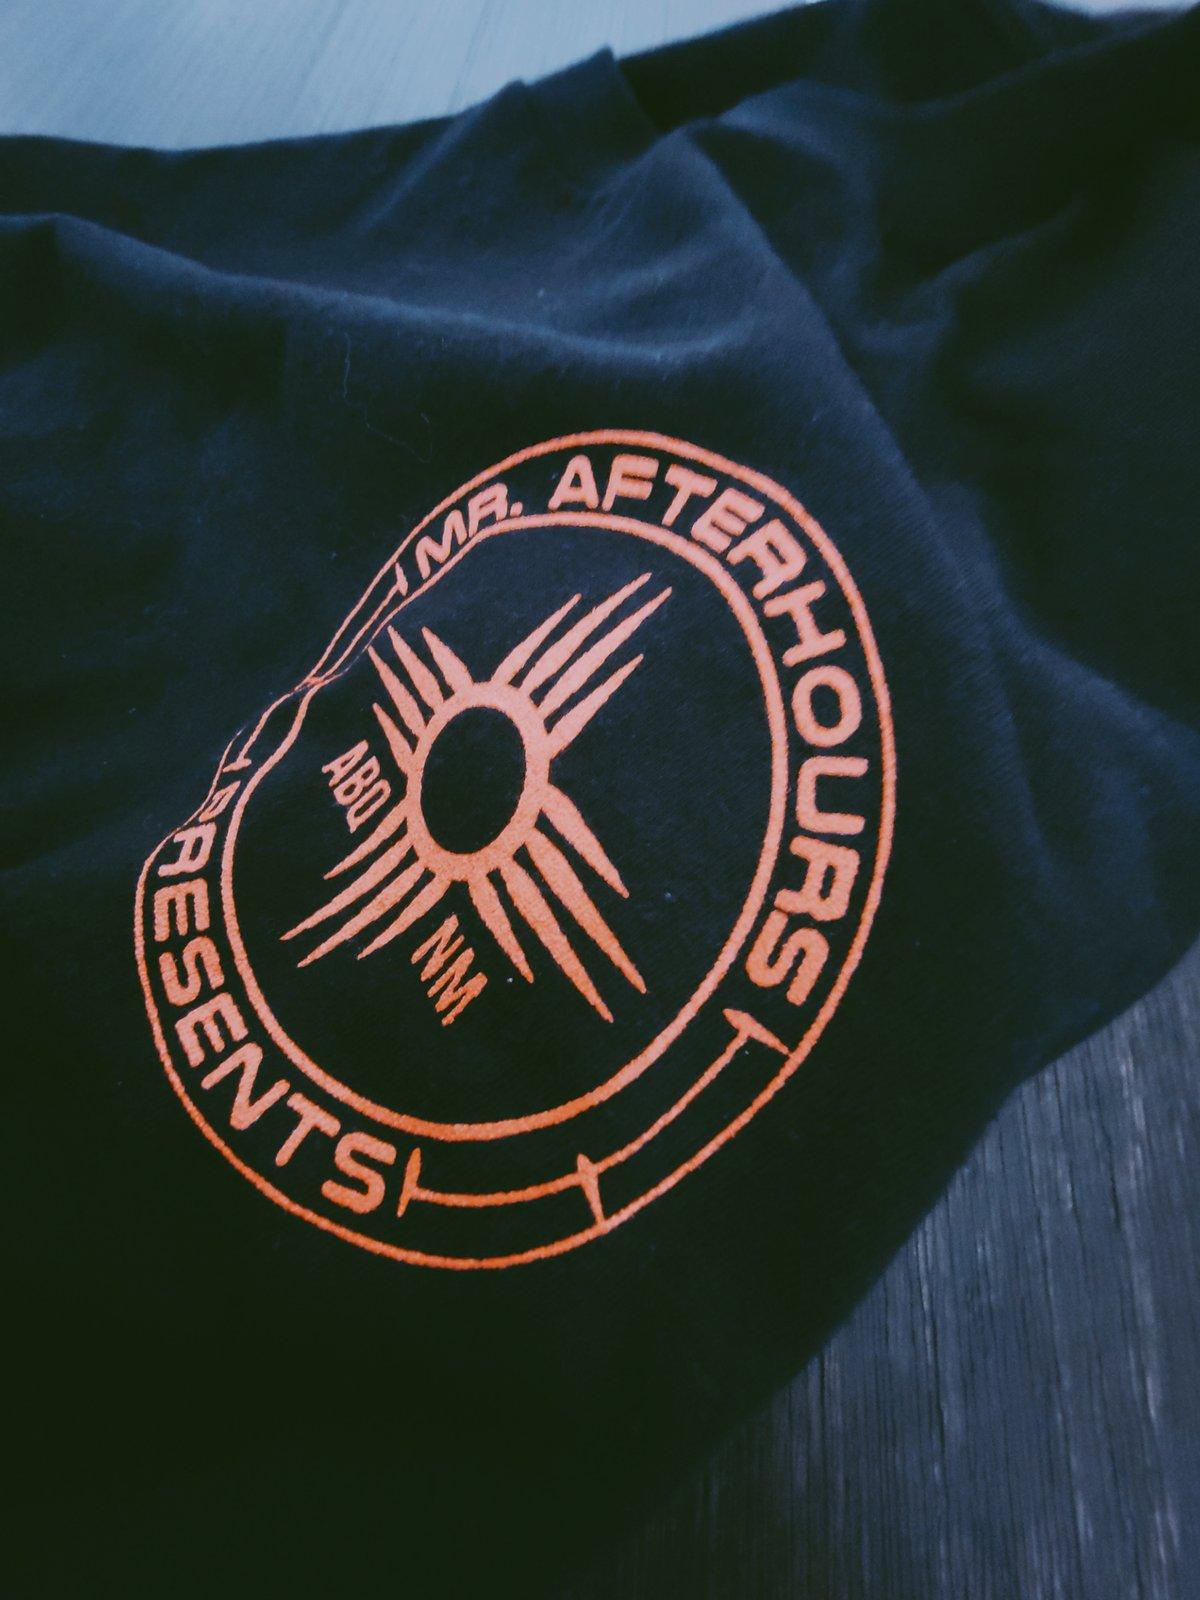 Mr Afterhours Orange on Black